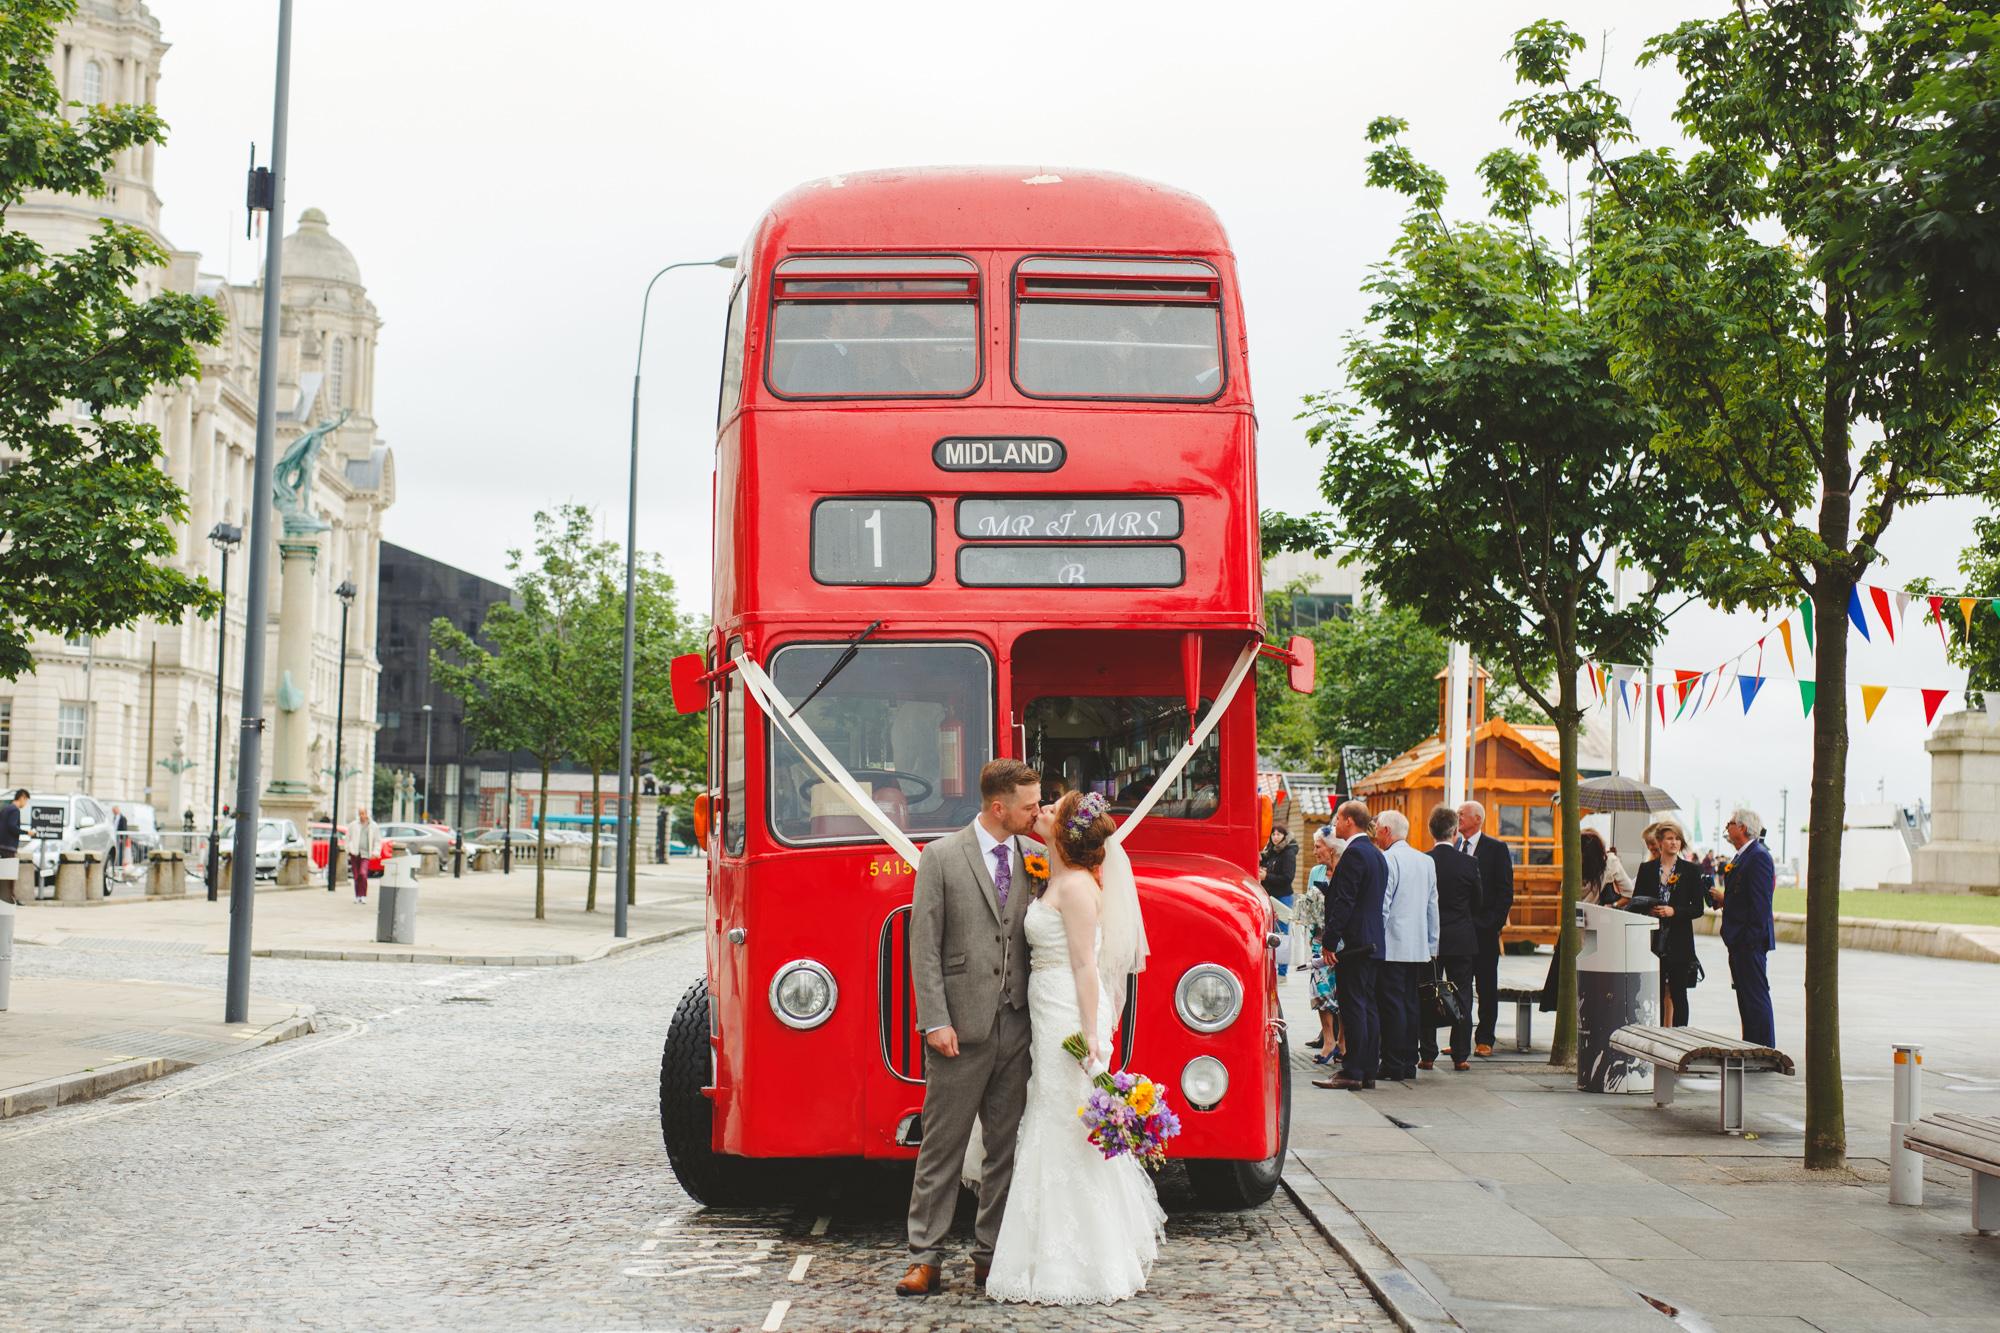 liverpool-town-hall-wedding-photography-7.jpg